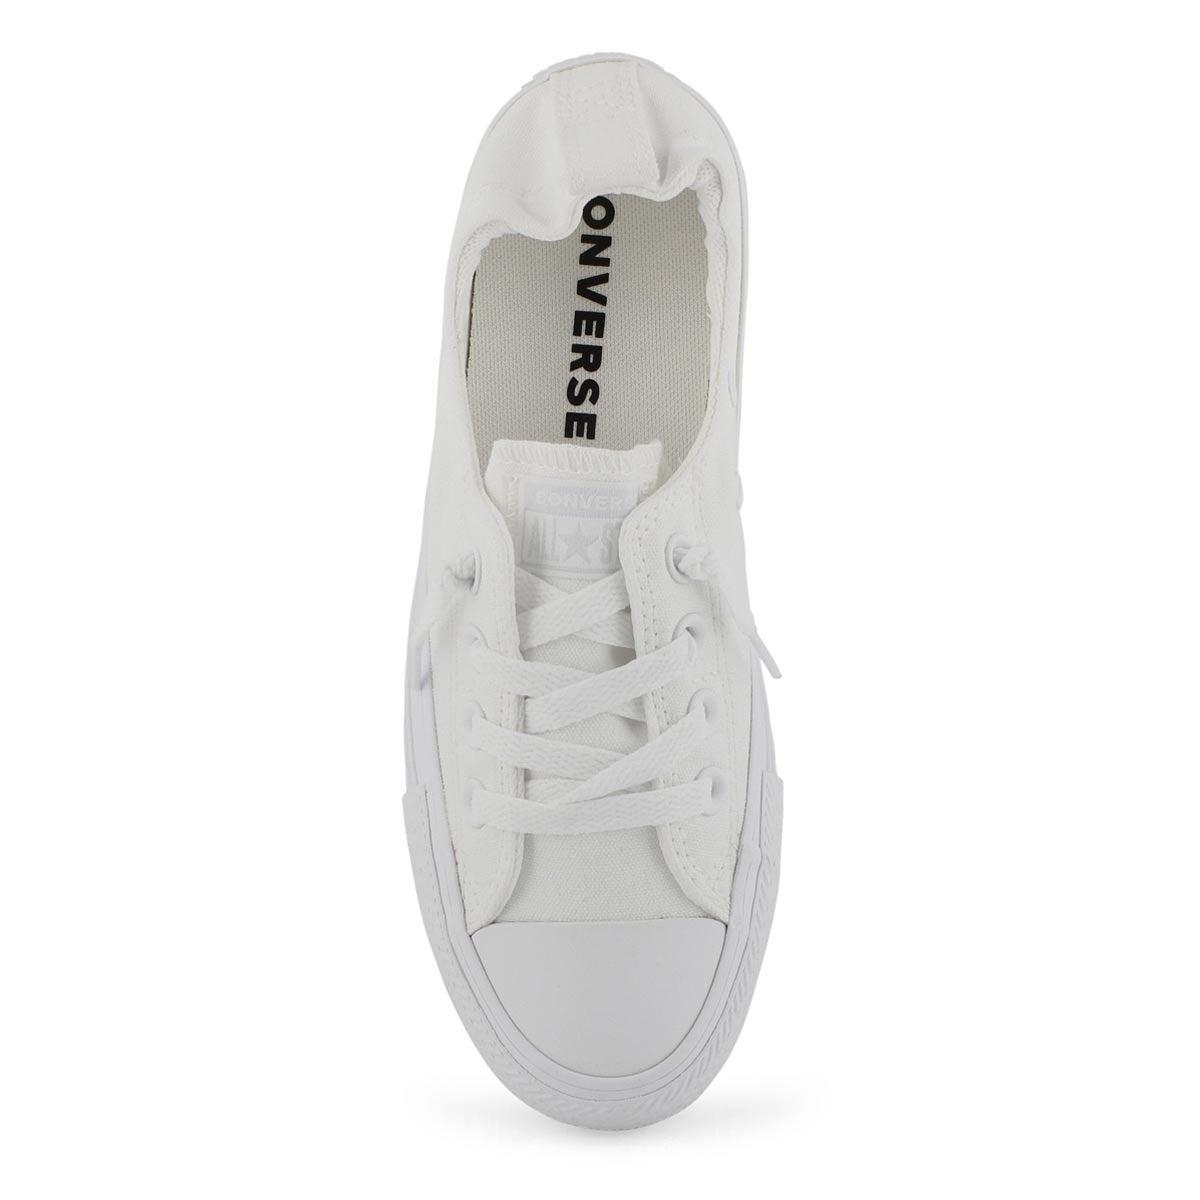 Lds CTAS Shoreline white mono sneaker